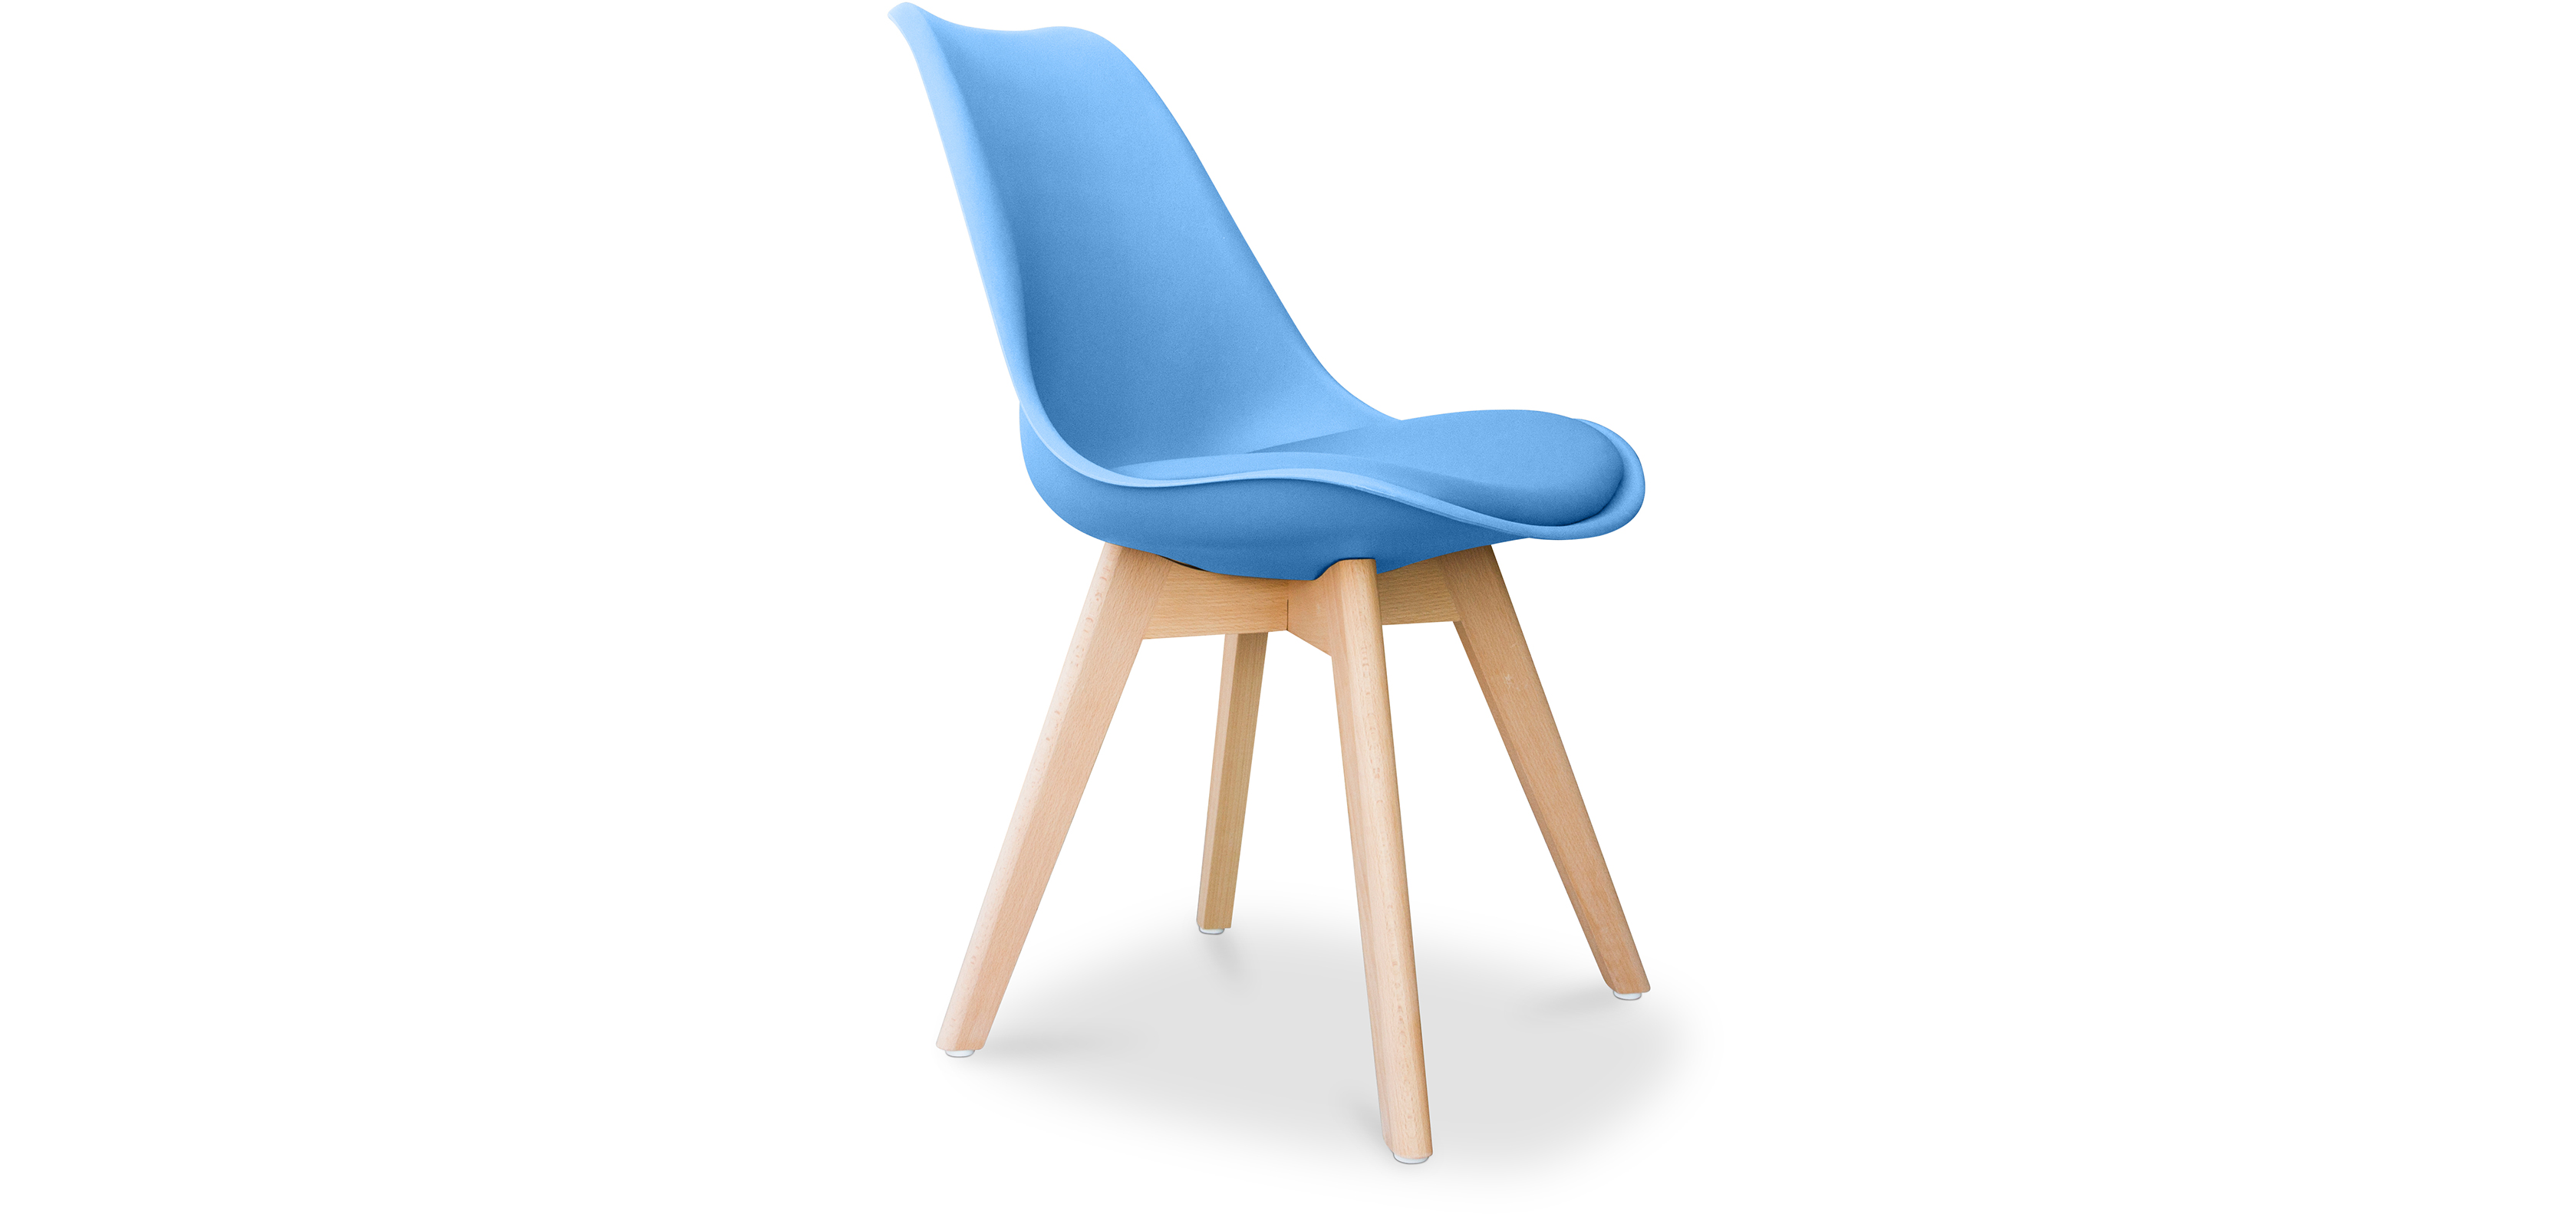 Geneva stuhl mit kissen skandinavisches design kunststoff for Stuhl skandinavisches design